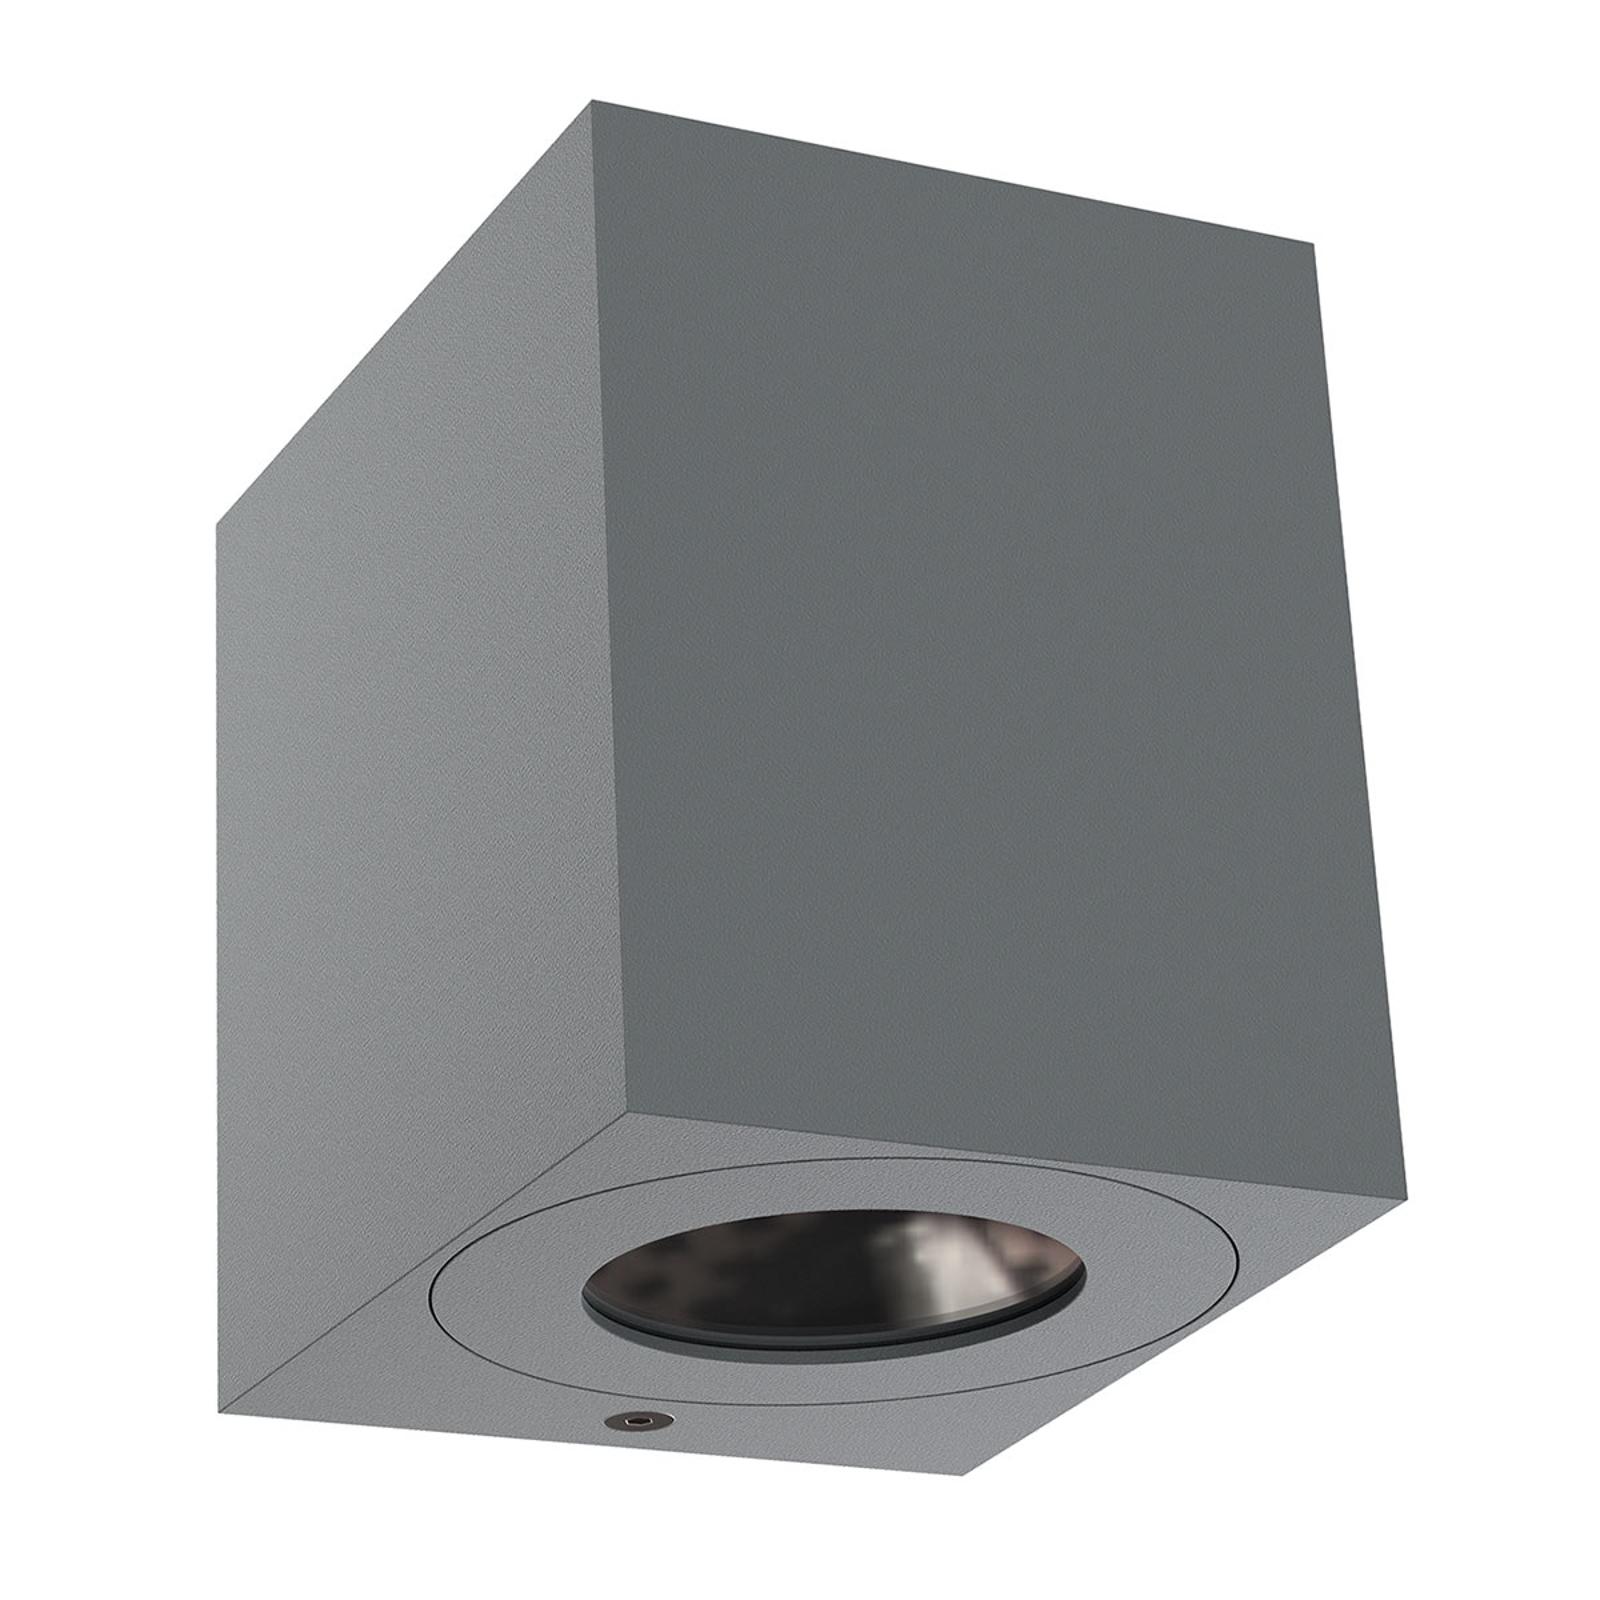 LED buitenwandlamp Canto Kubi 2, 10 cm, grijs